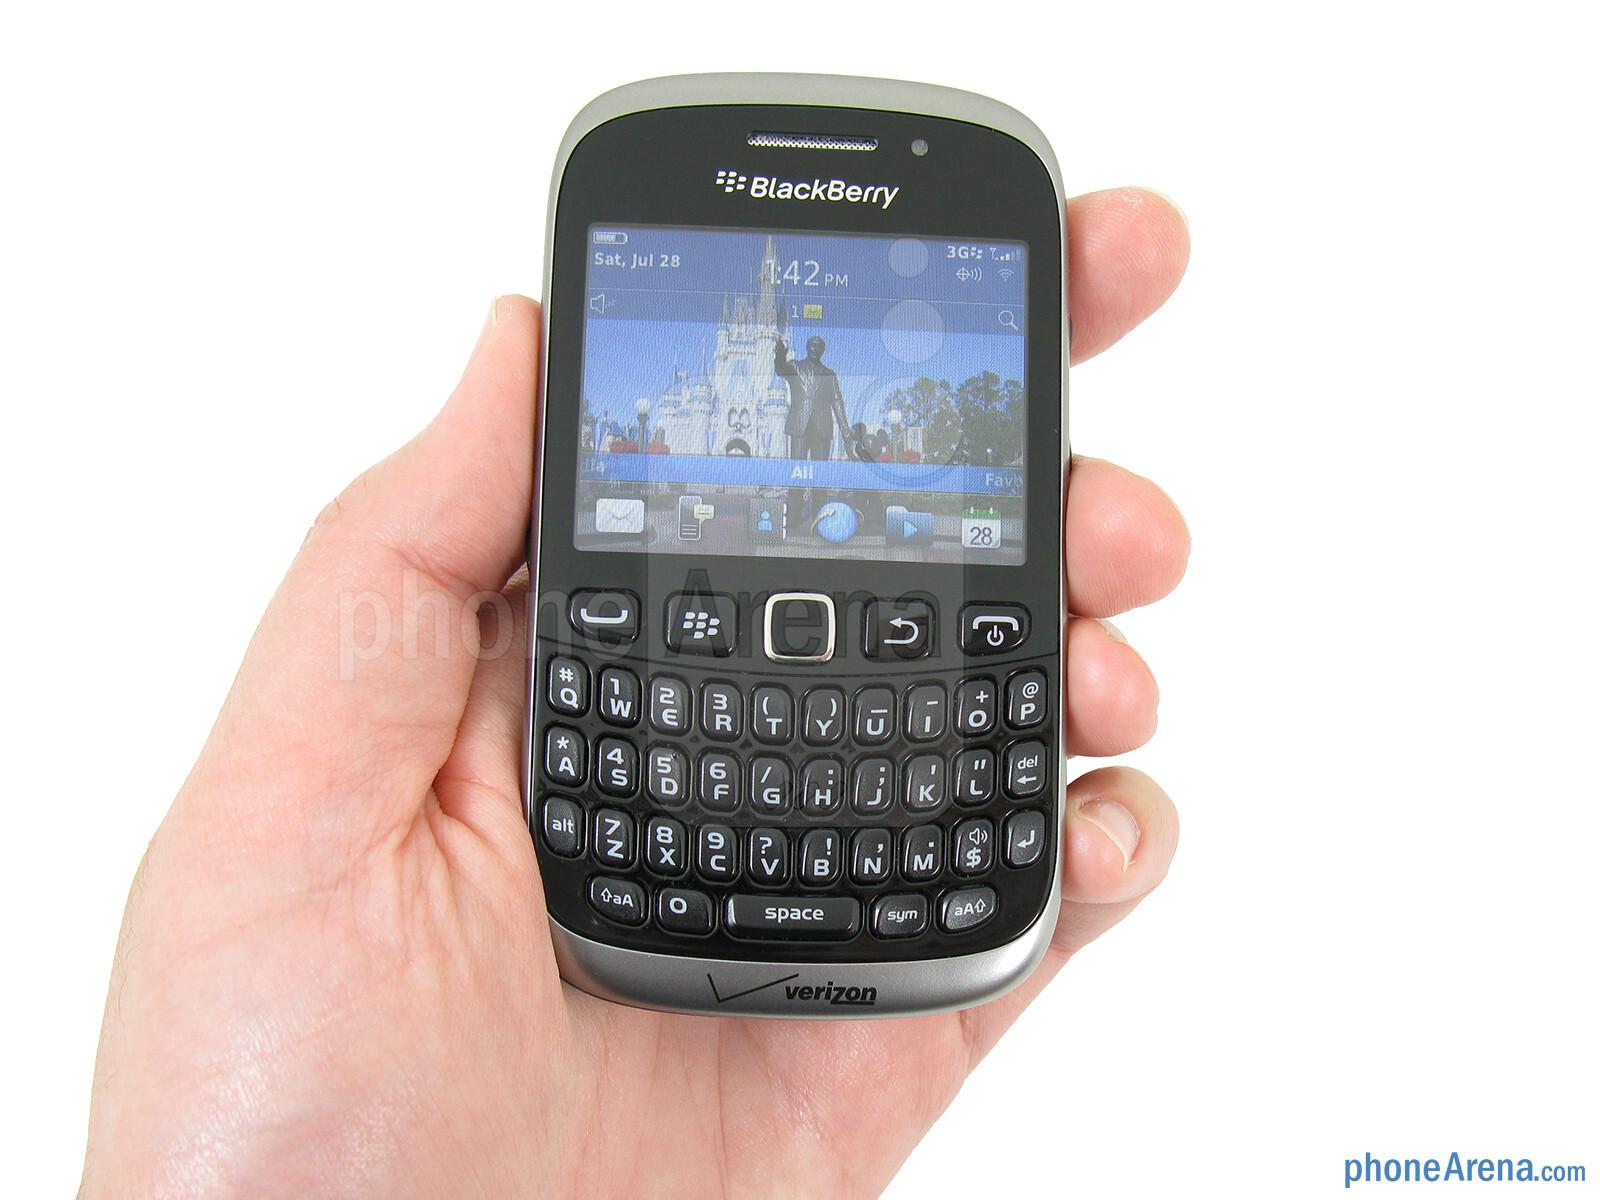 rim blackberry curve 3g 9310 review rh phonearena com Verizon BlackBerry Curve Phone BlackBerry Curve 9320